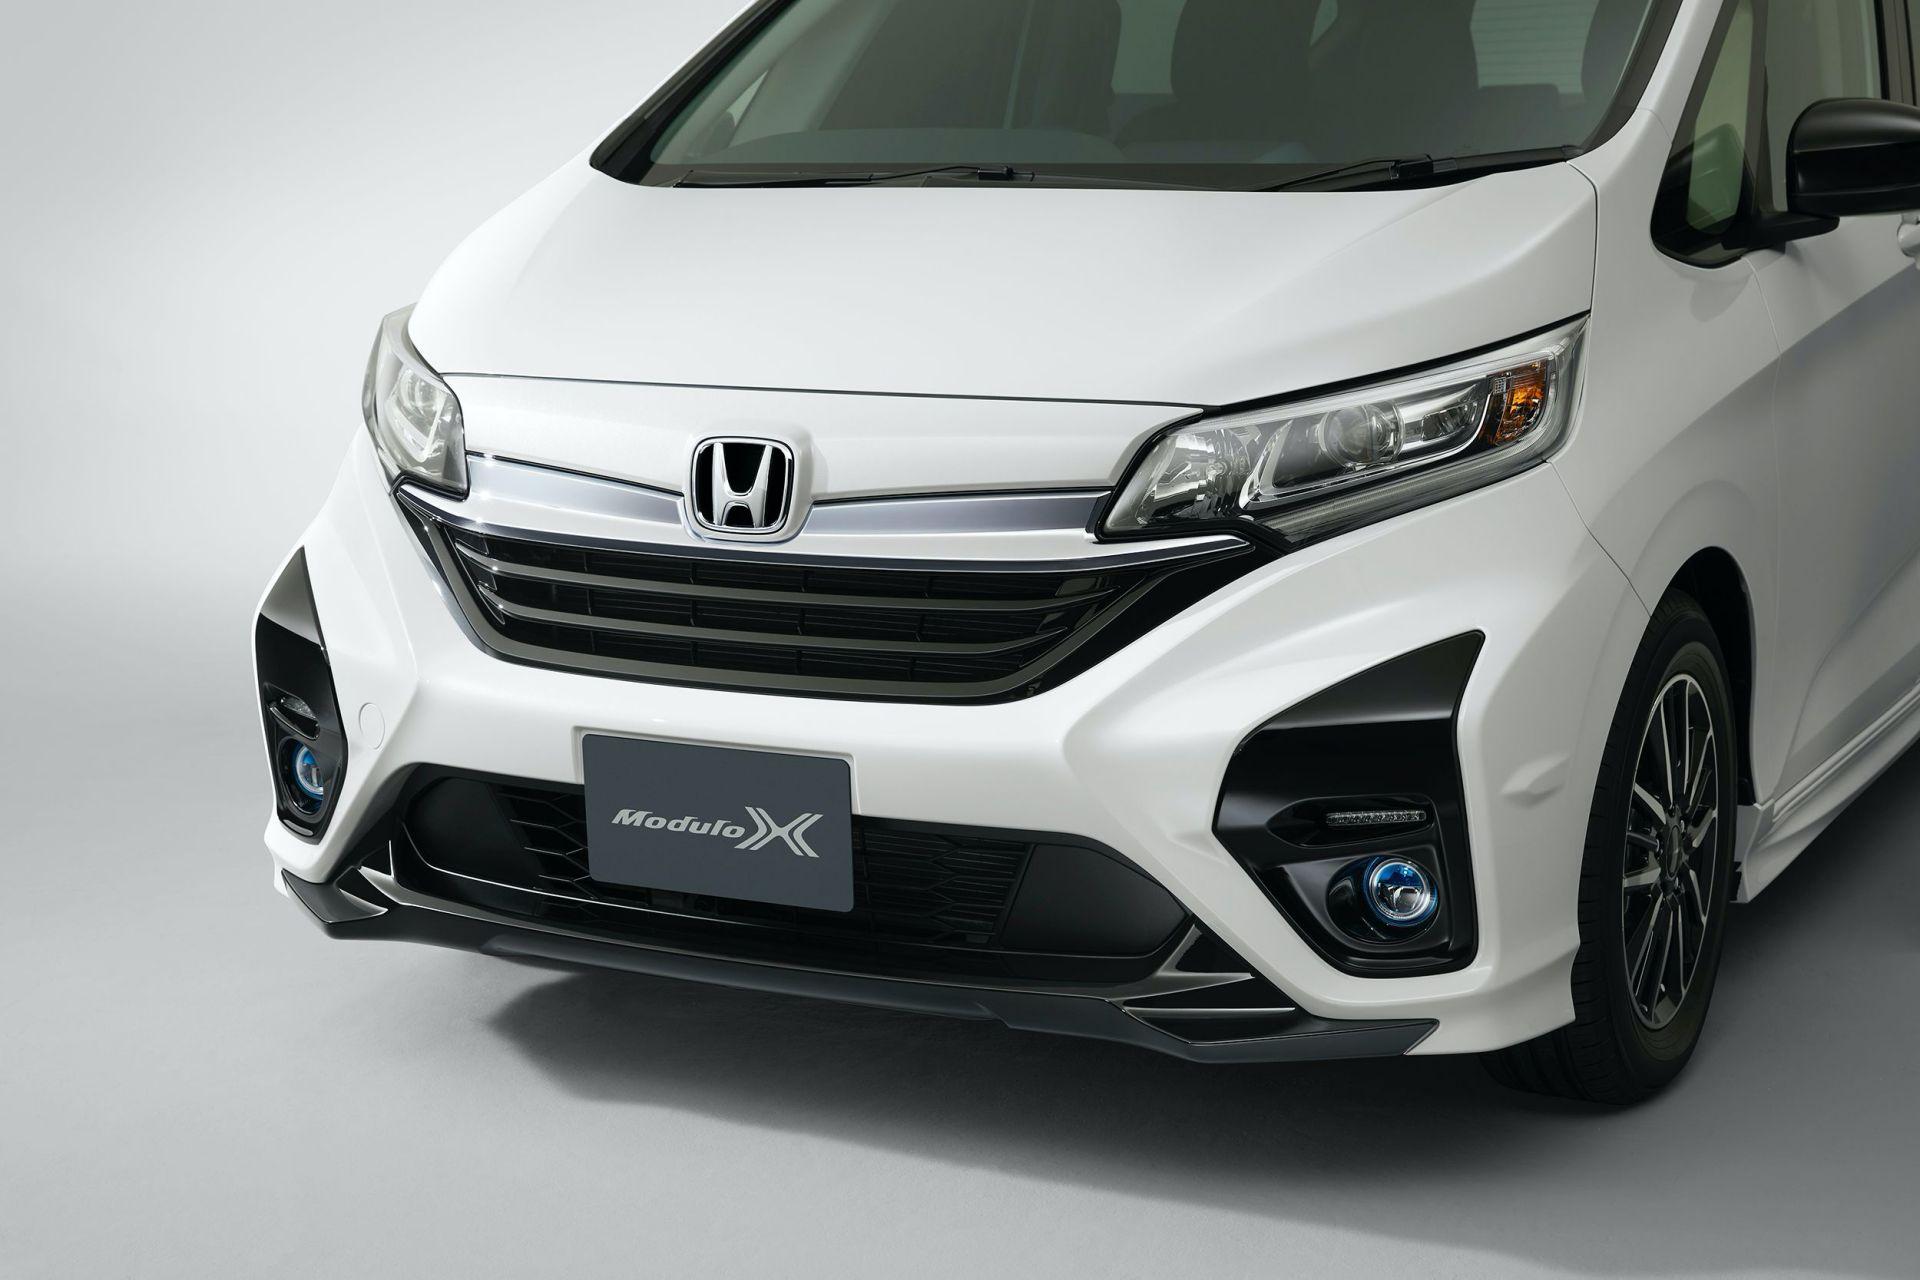 Honda-Freed-Modulo-X-Facelift-2020-38